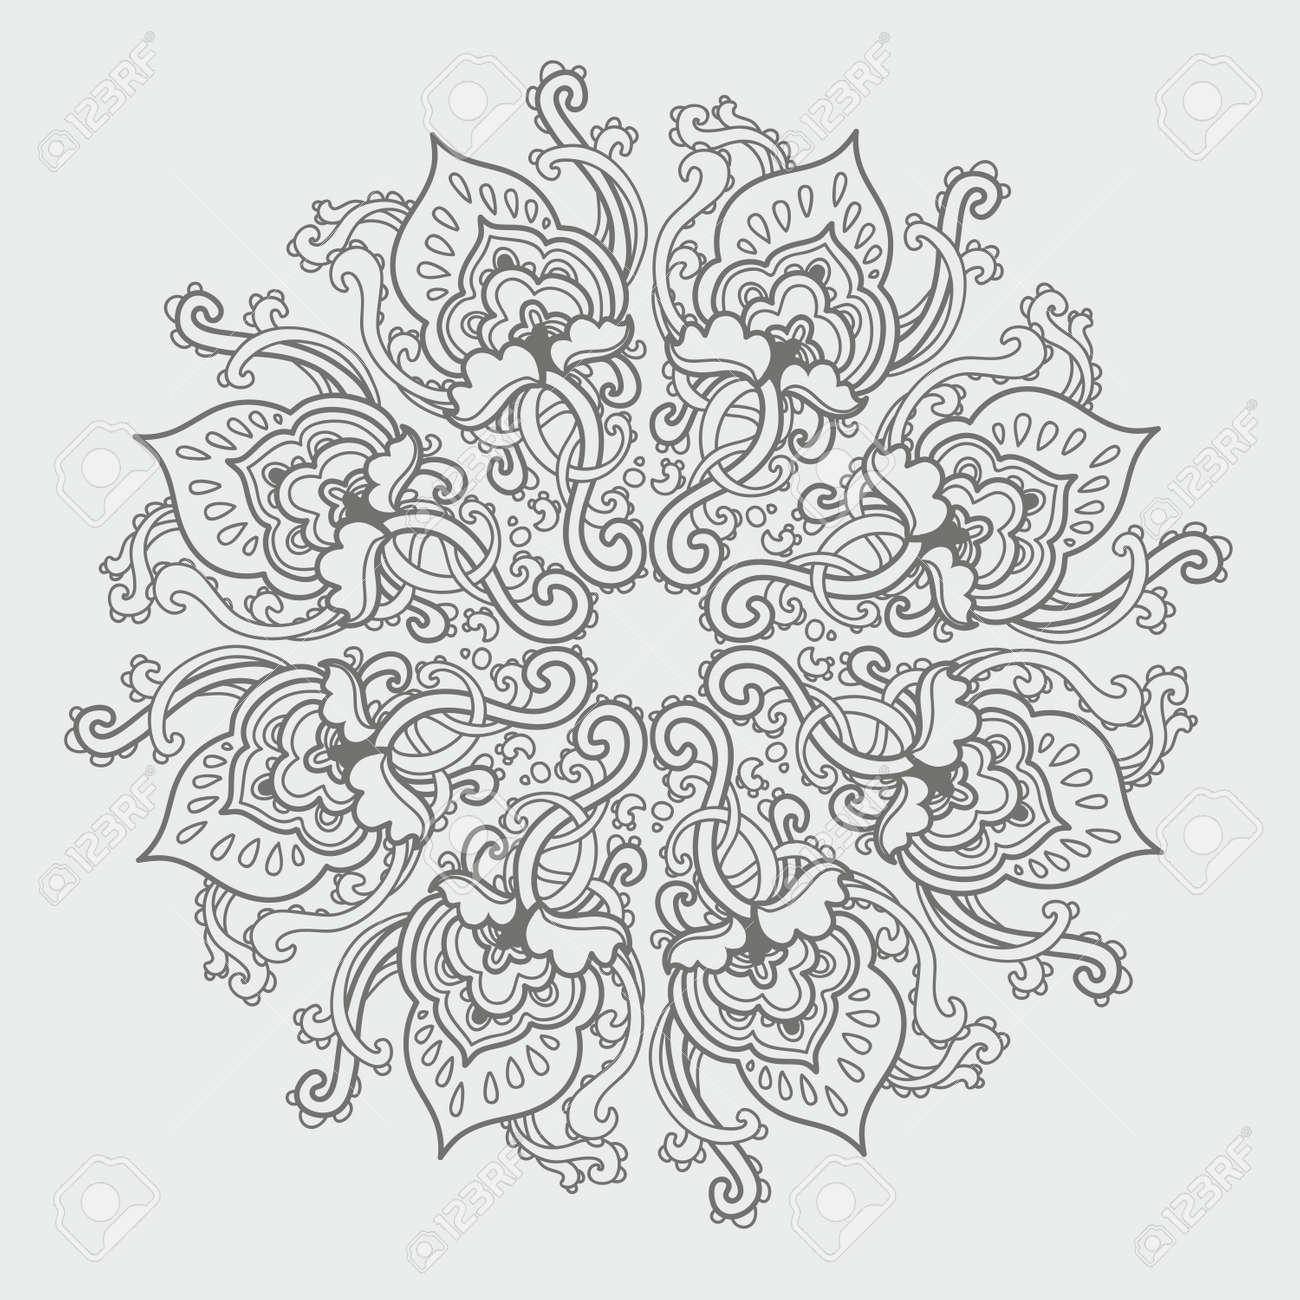 Ornamental round floral lace pattern. kaleidoscopic floral pattern, mandala. - 14778302